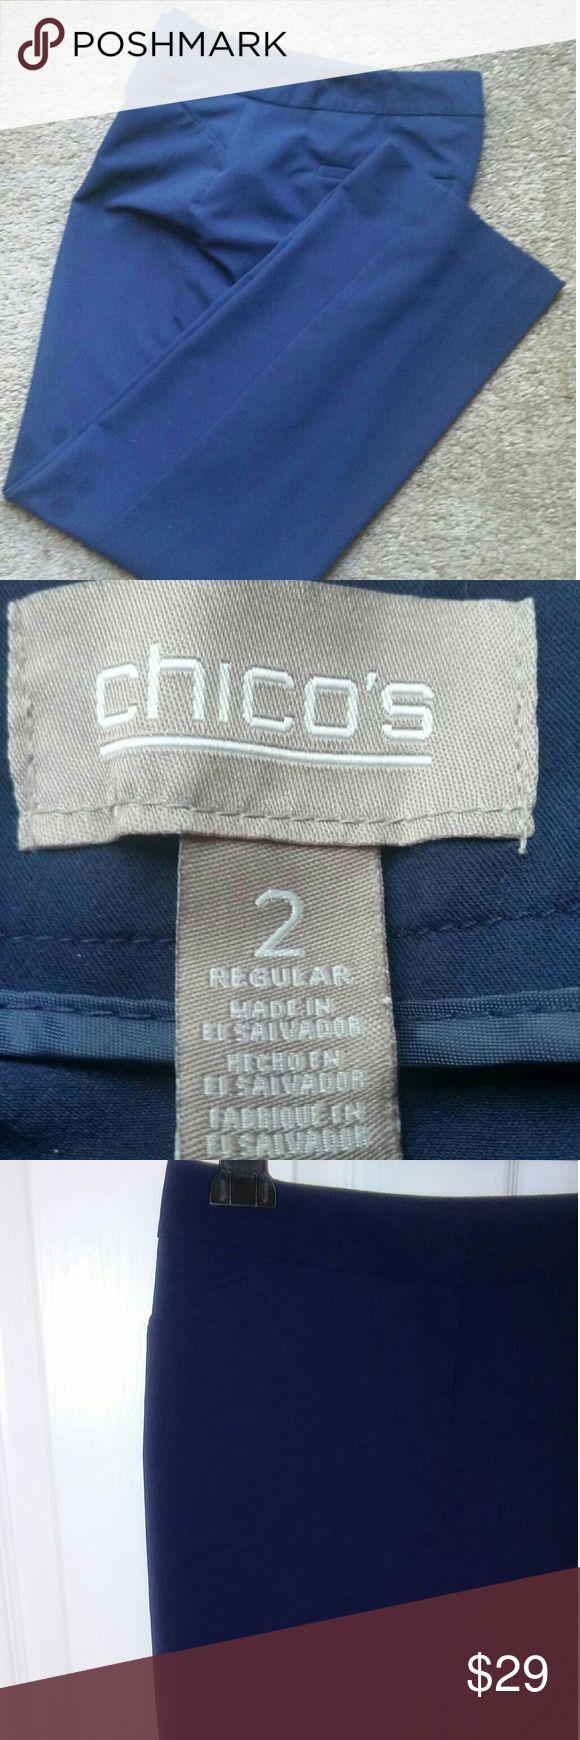 Chico's Navy Blue dress pants sz 2 (regular L/12) Nice light summer weight fabric.. Chico's Pants